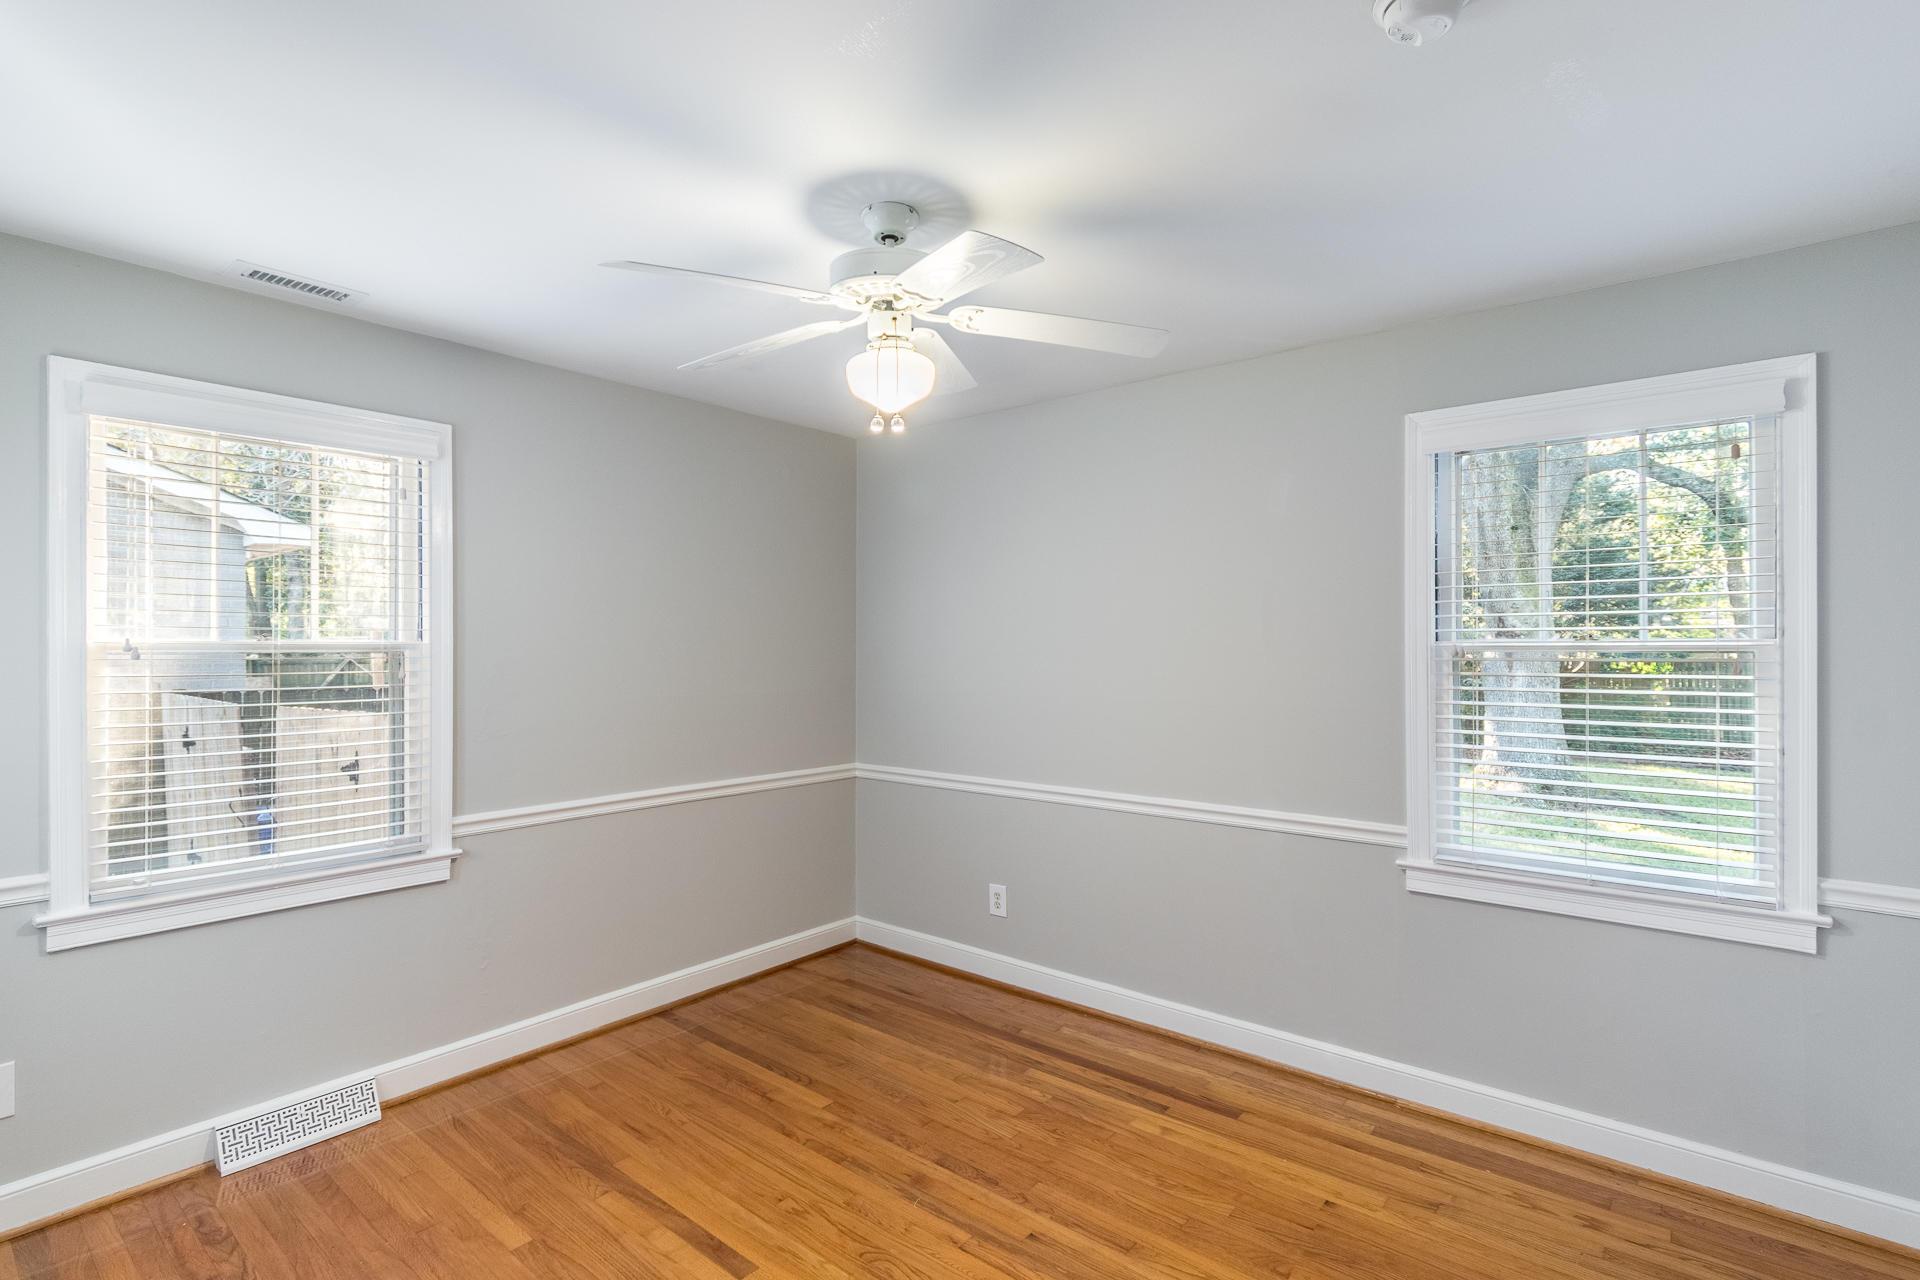 Edgewood Gardens Homes For Sale - 507 Risher, Charleston, SC - 21